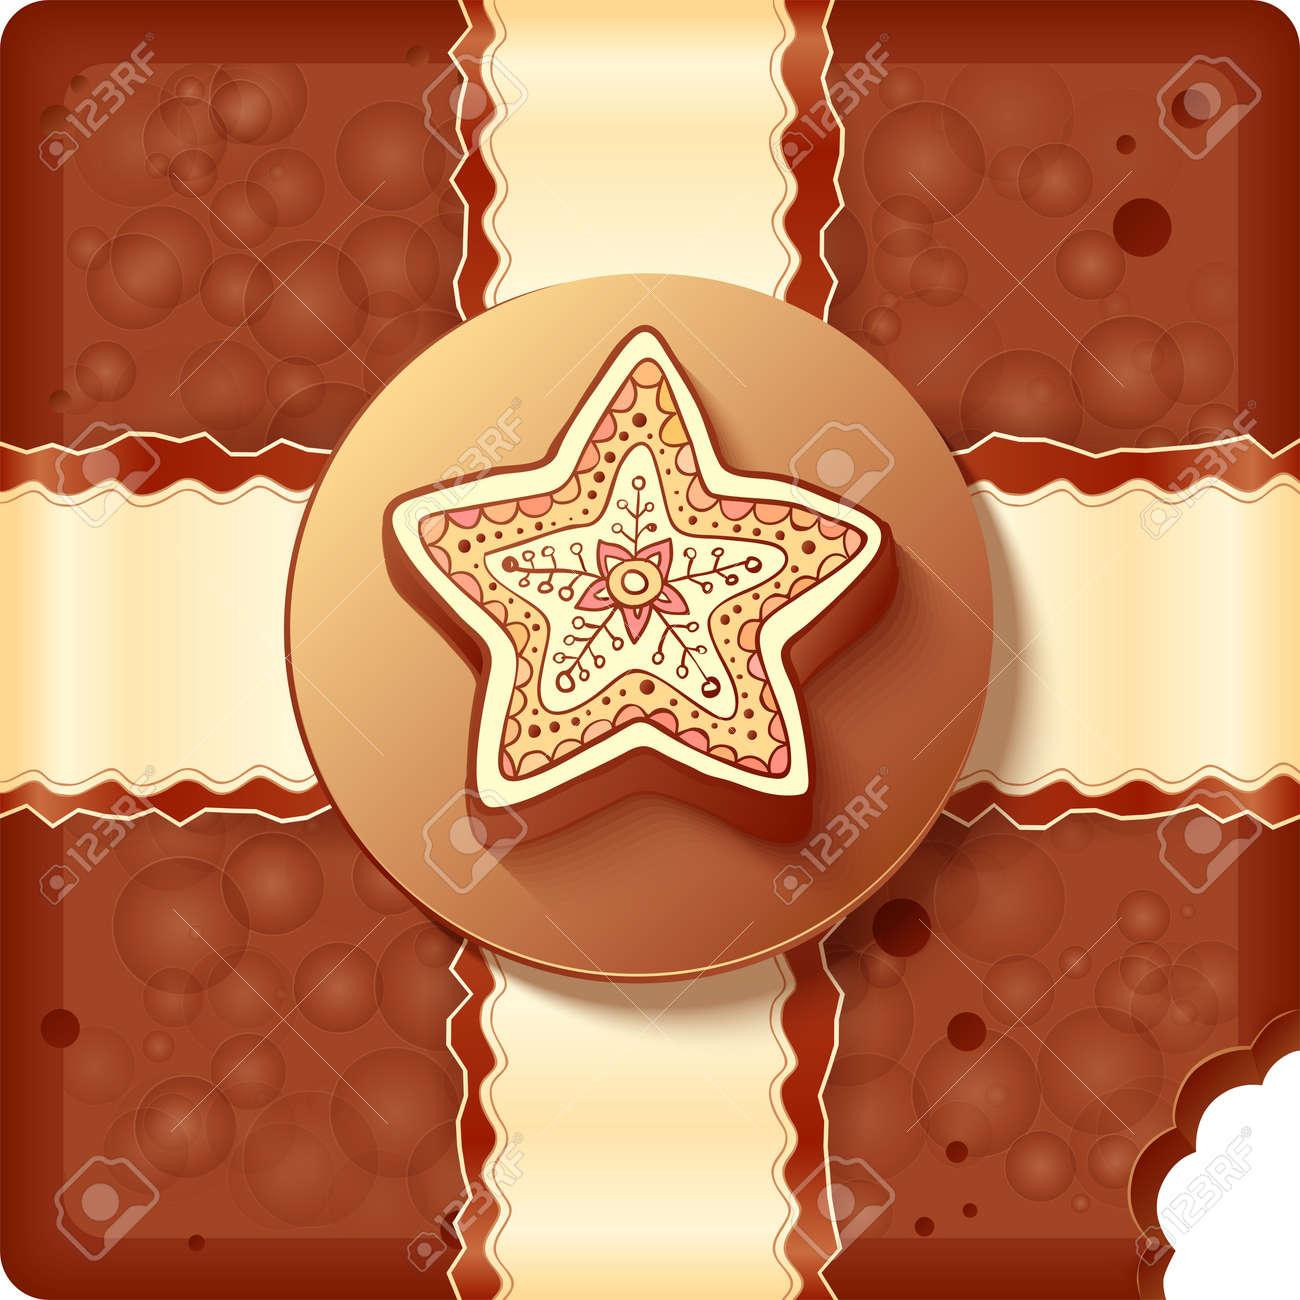 Christmas chocolate box with chocolate badge and ribbon Stock Vector - 16403270